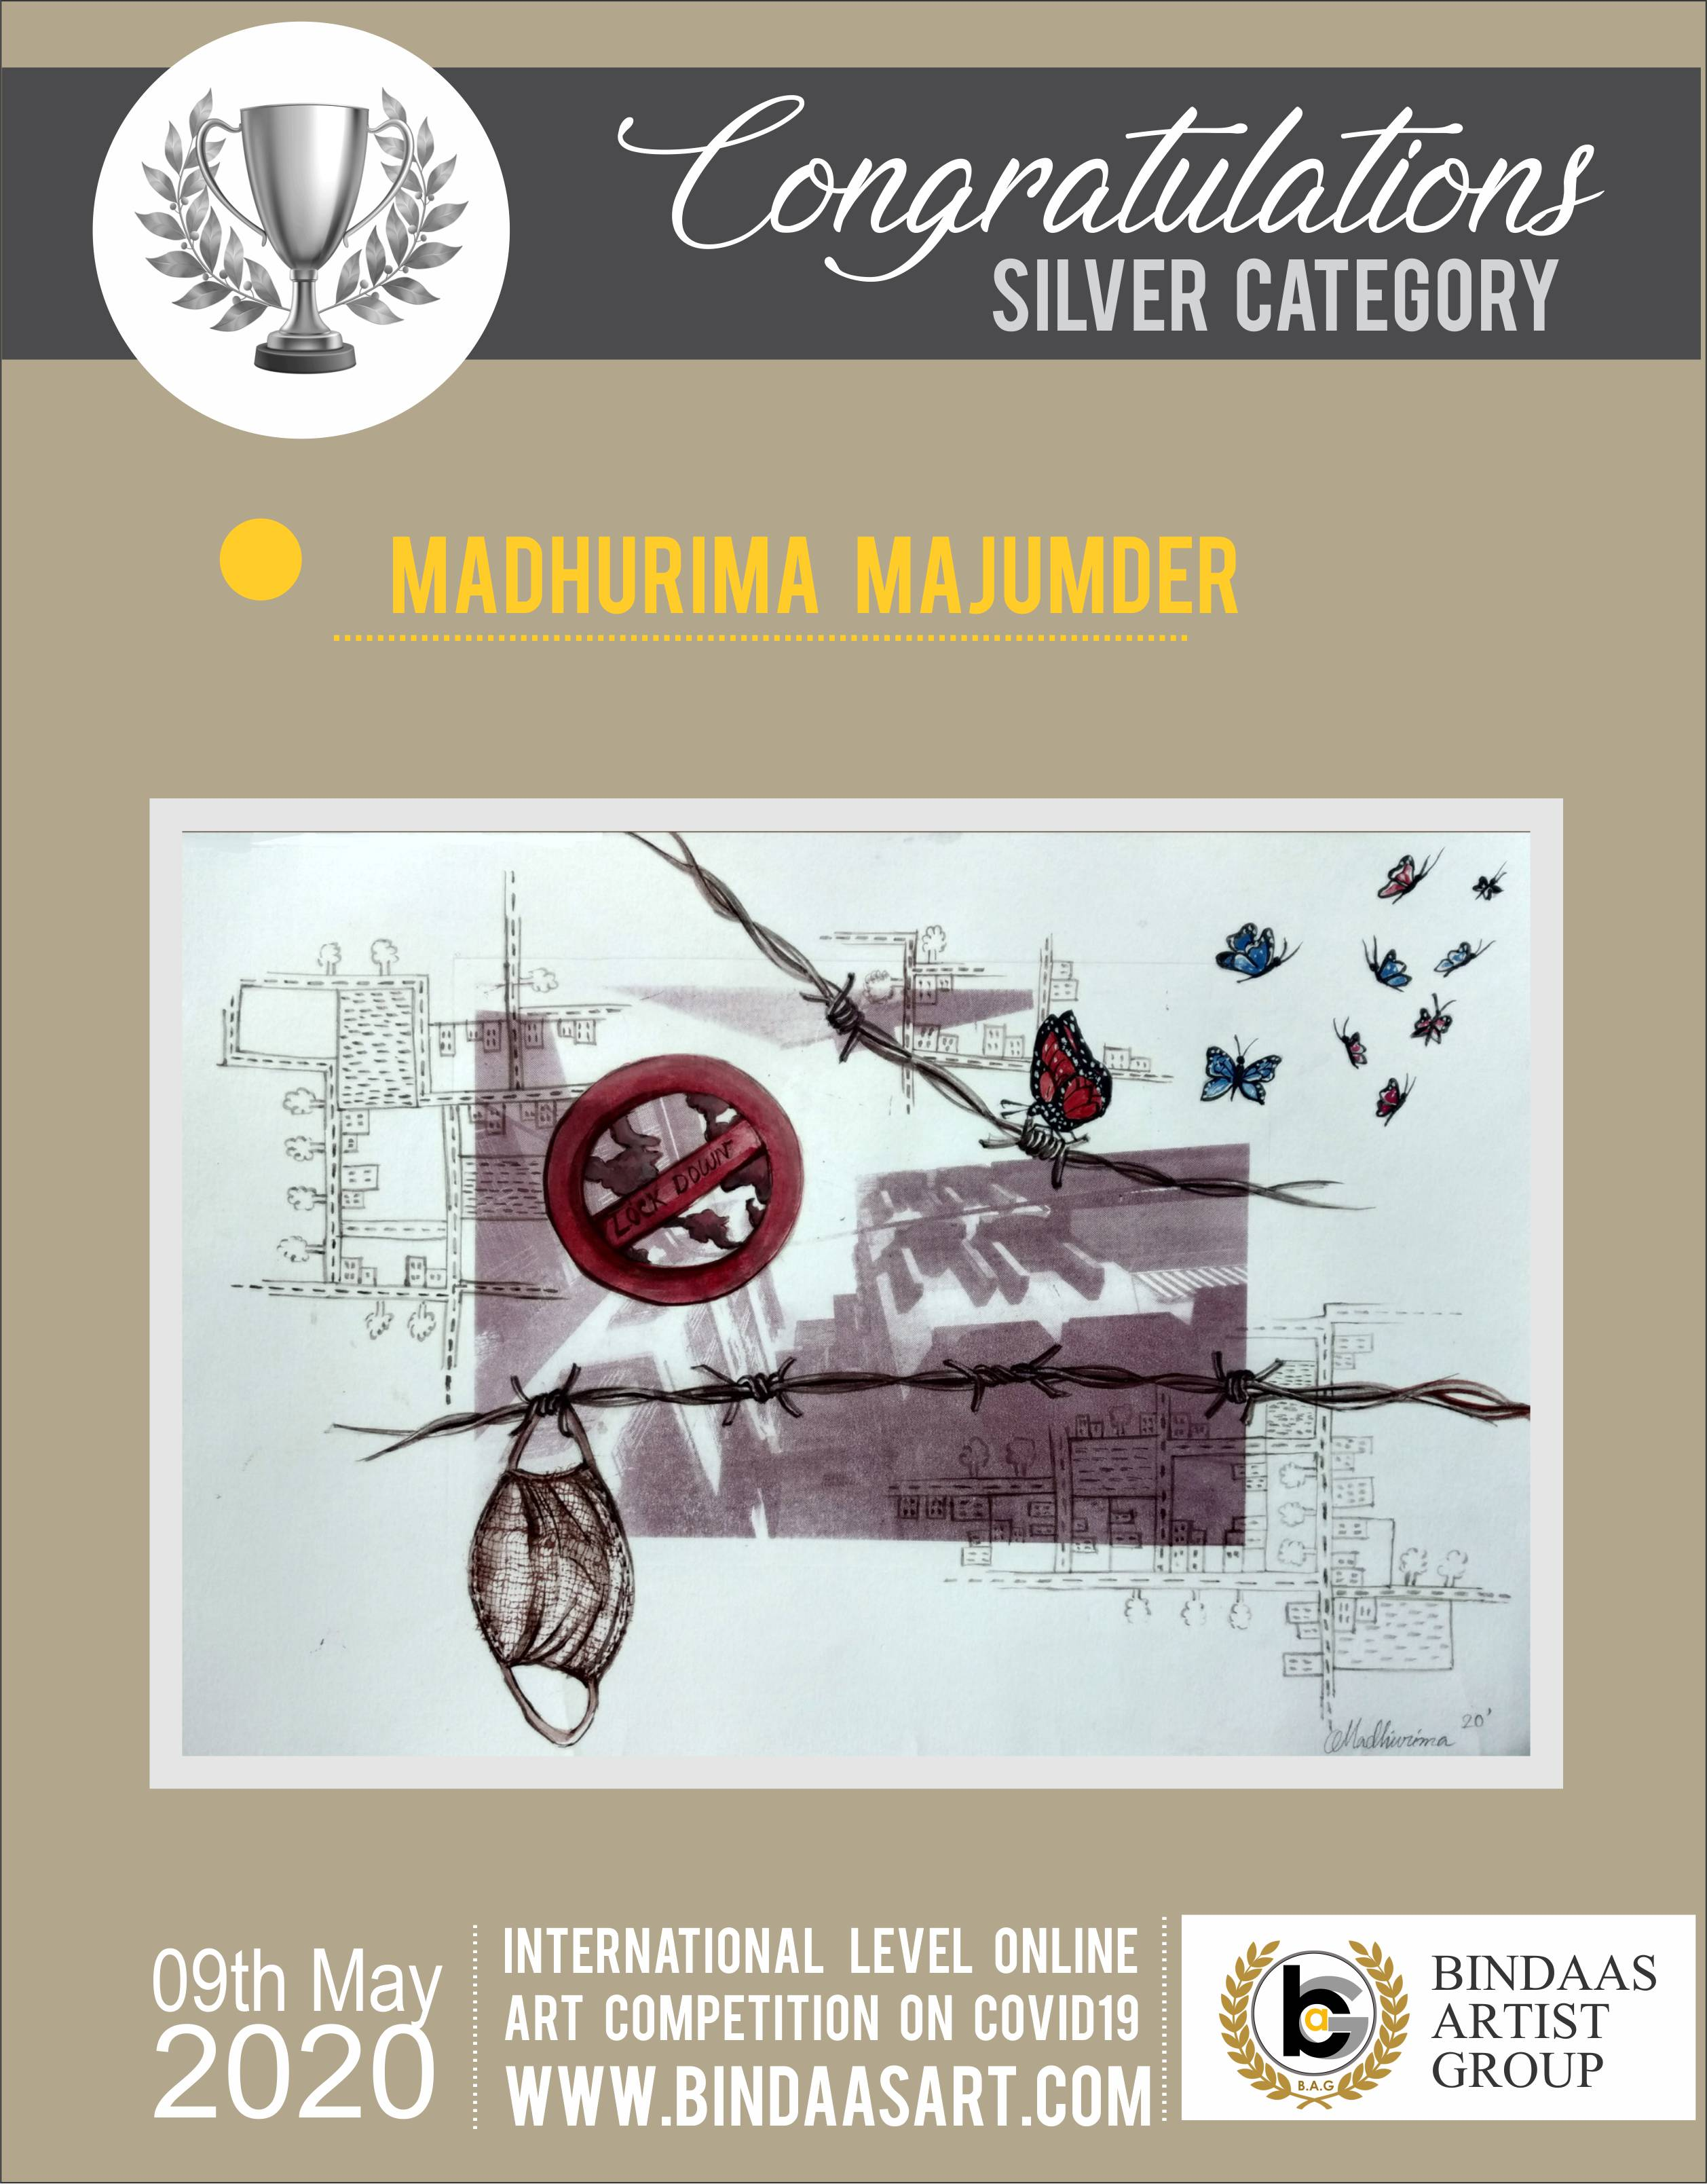 Madhurima Majumder